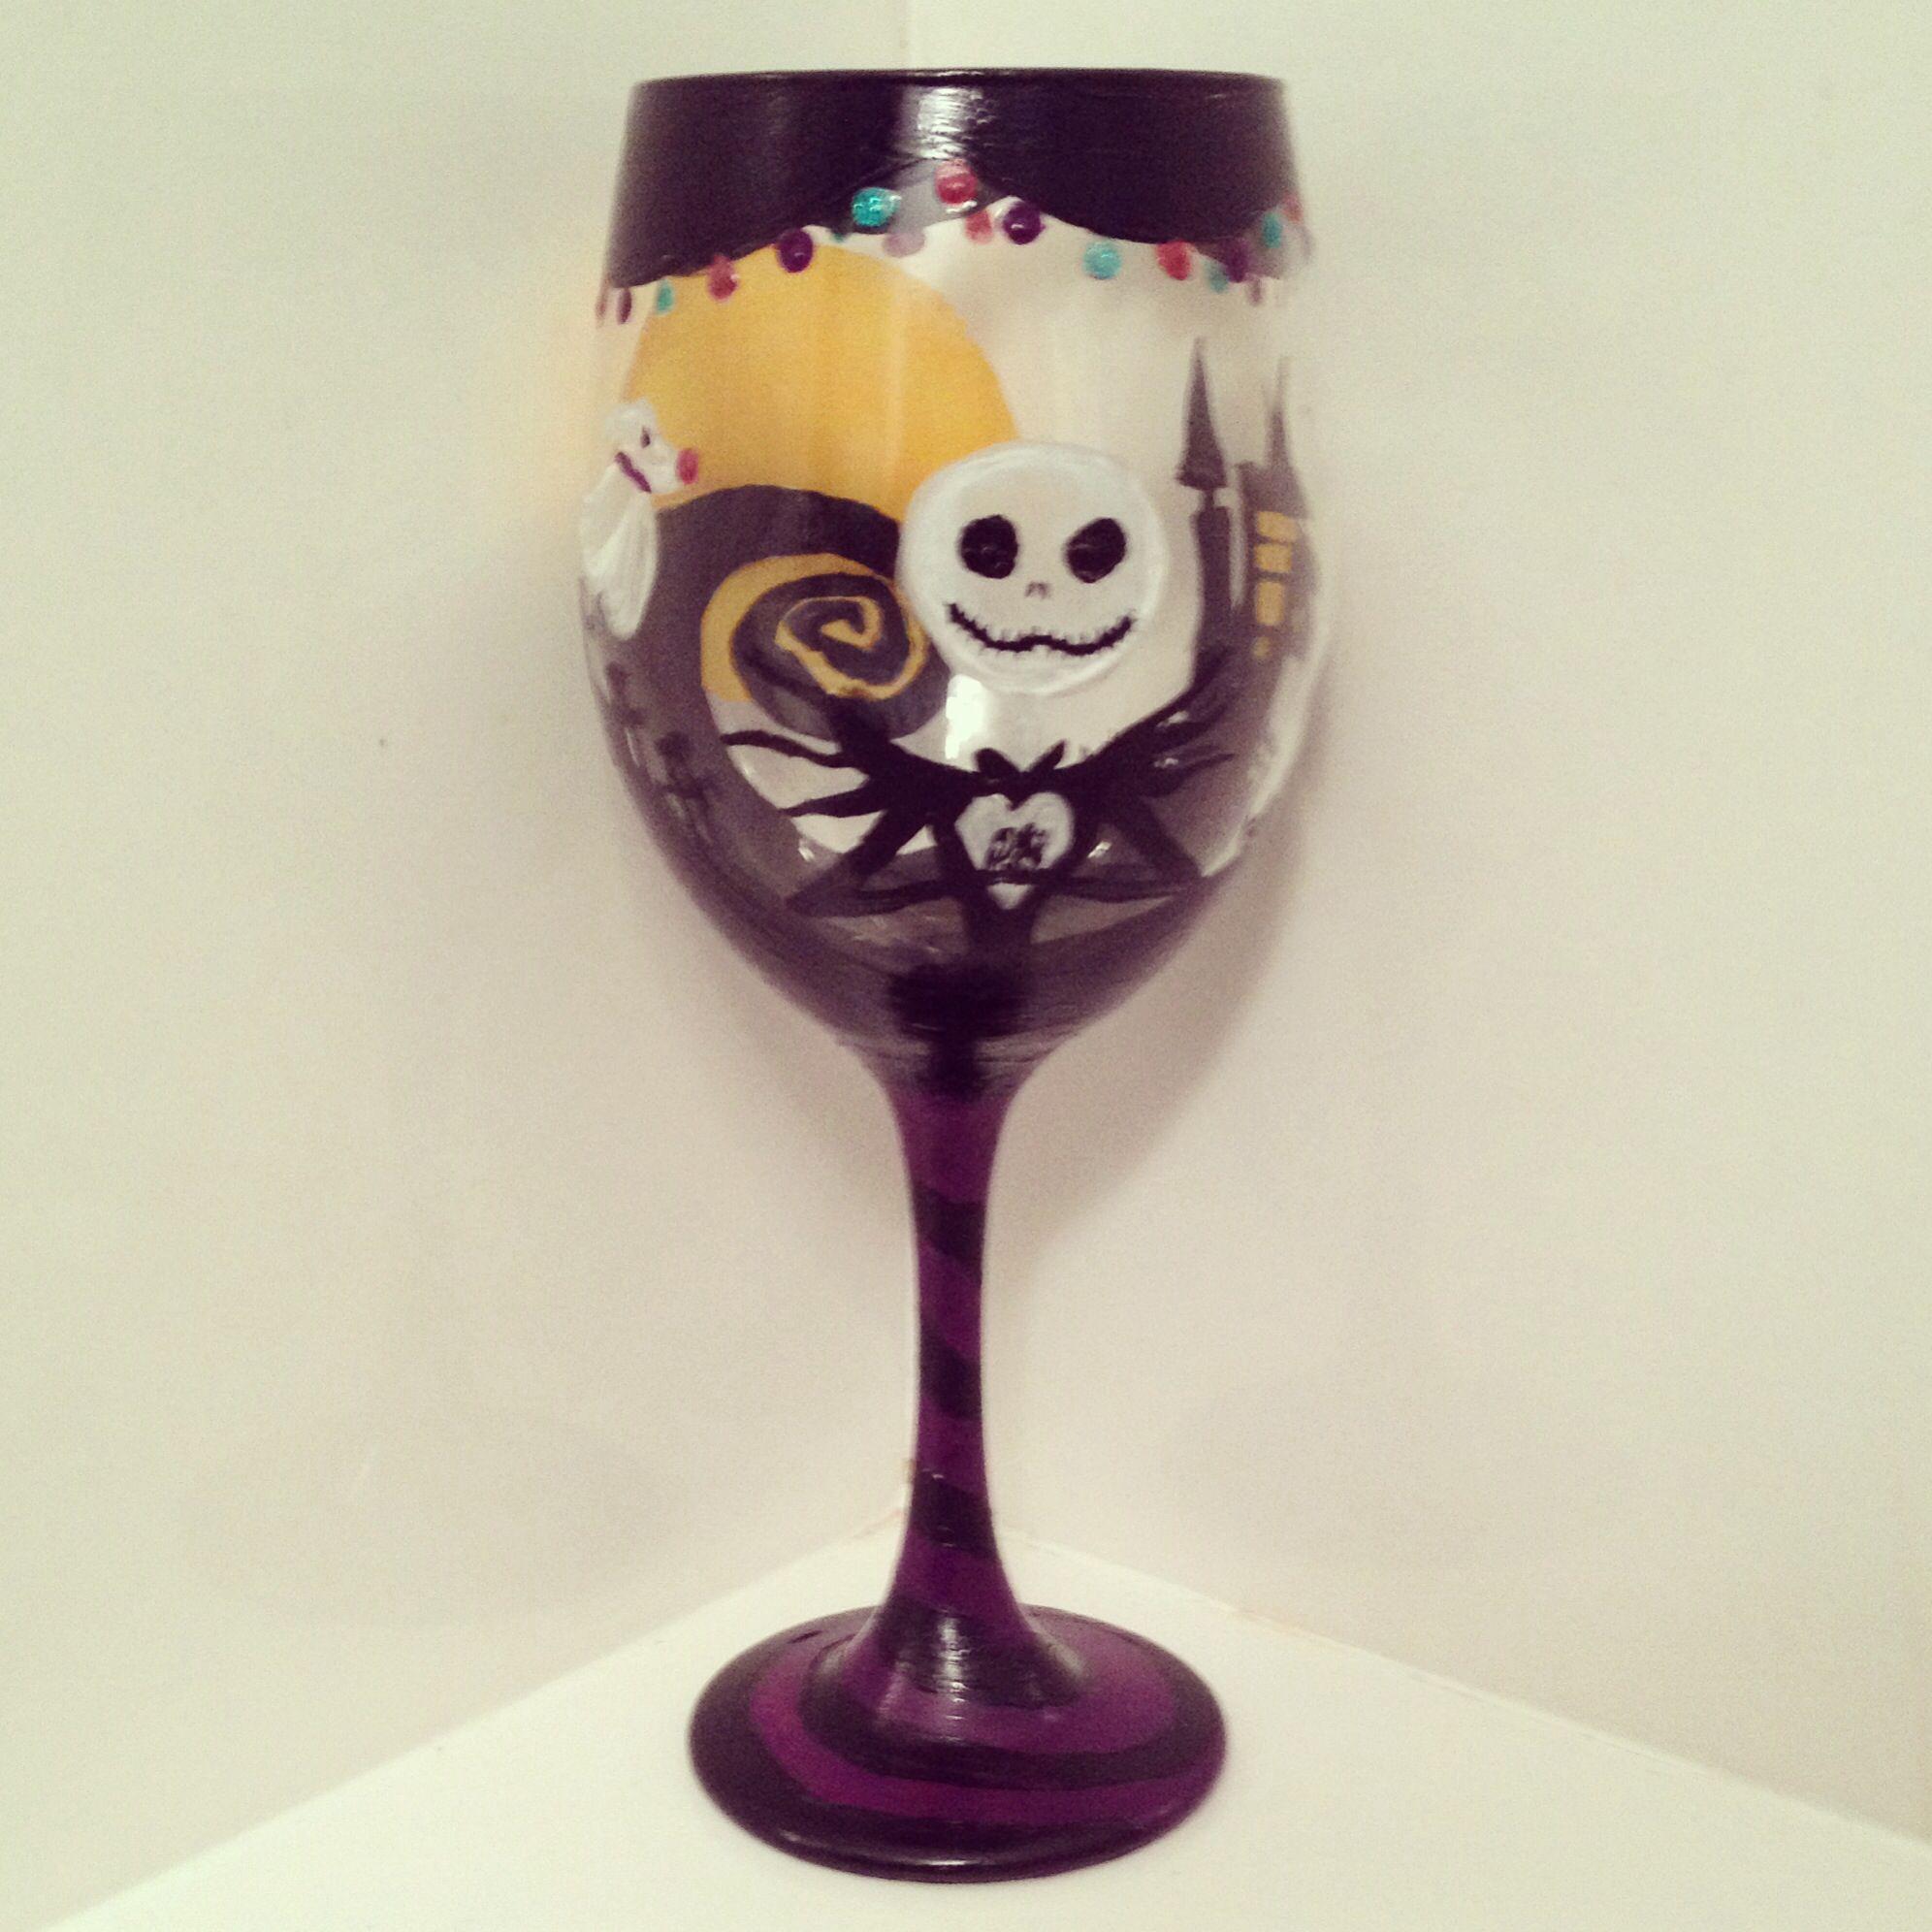 Nightmare Before Christmas Wine Glass! | Wine Glasses | Pinterest ...